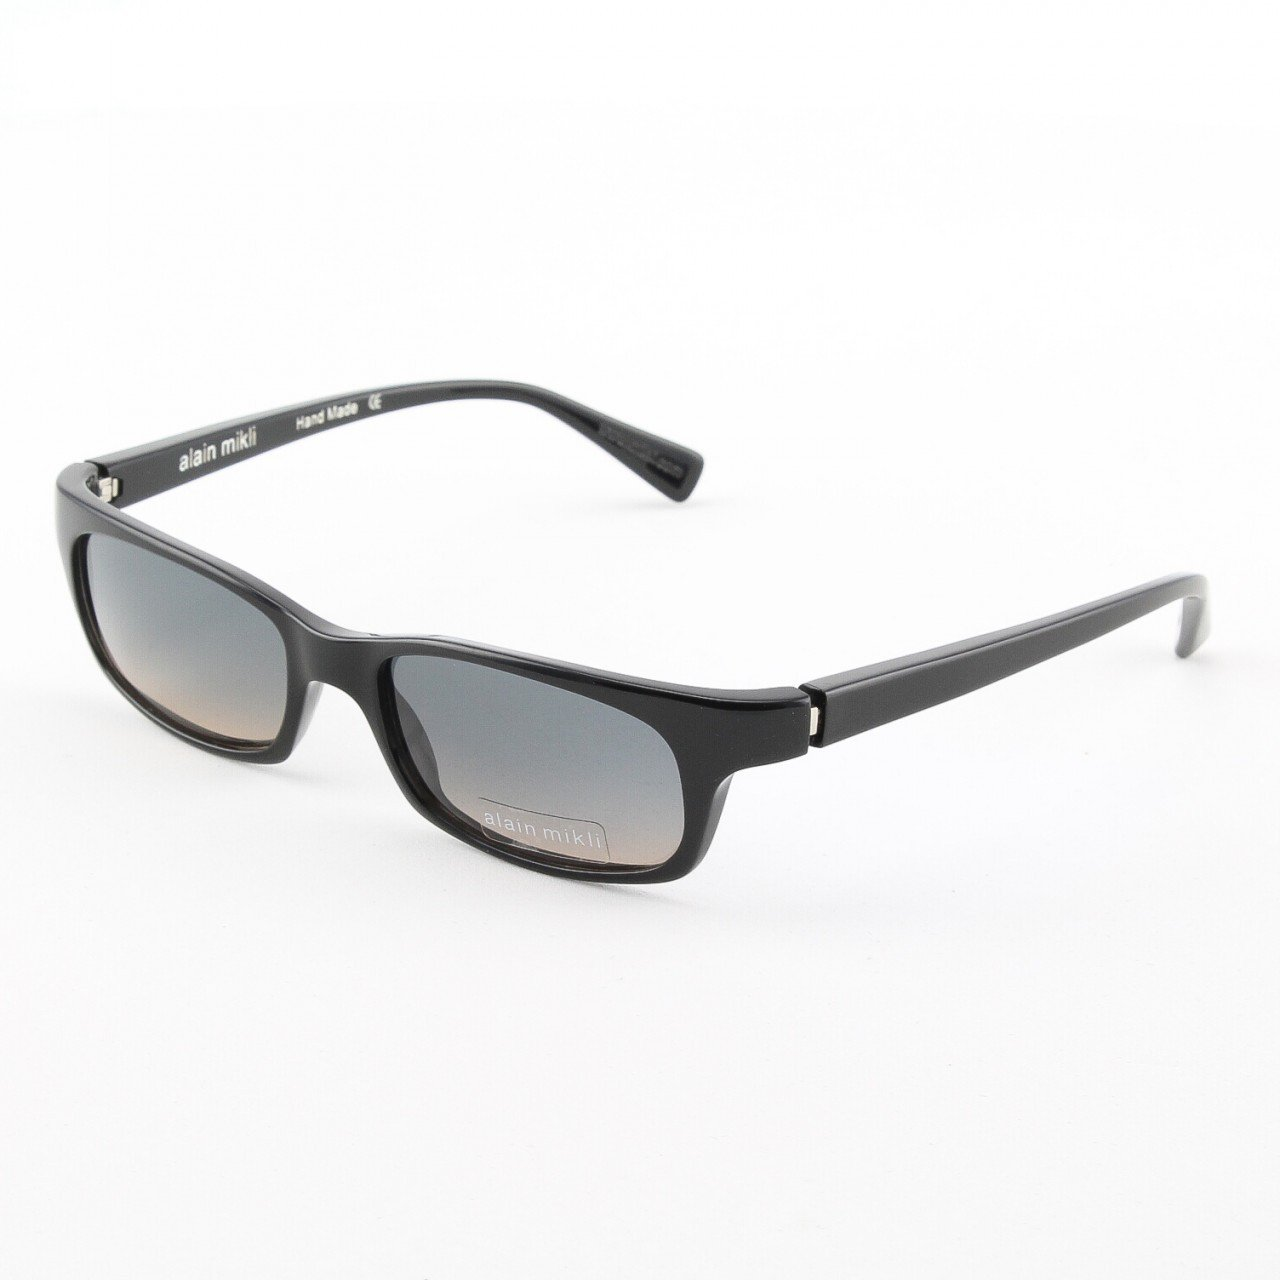 Alain Mikli Eyeglasses AL0701 Col. 11 Black Frame